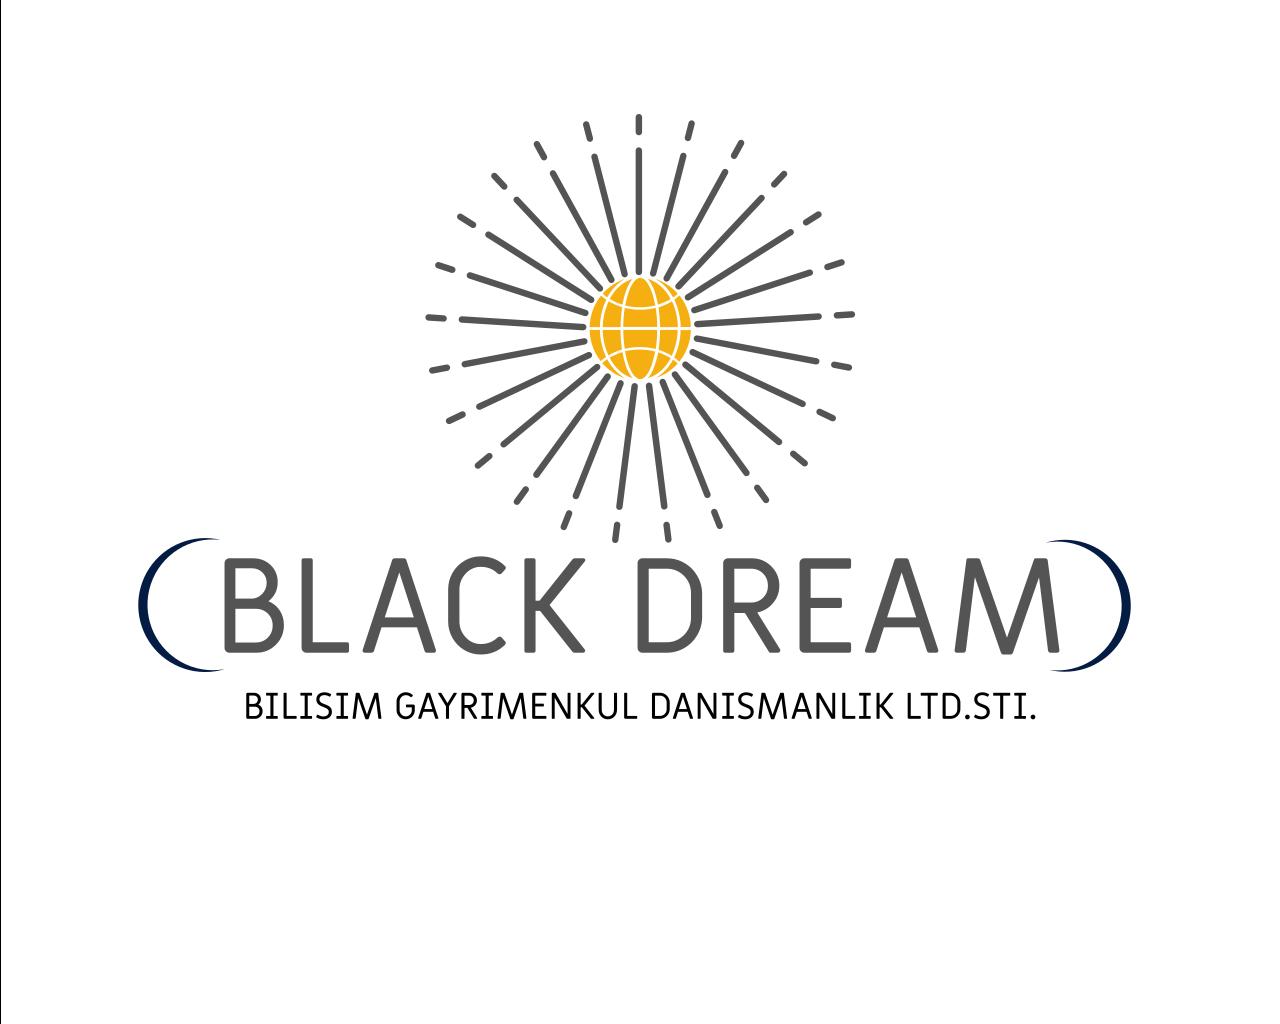 Black Dream Bilişim